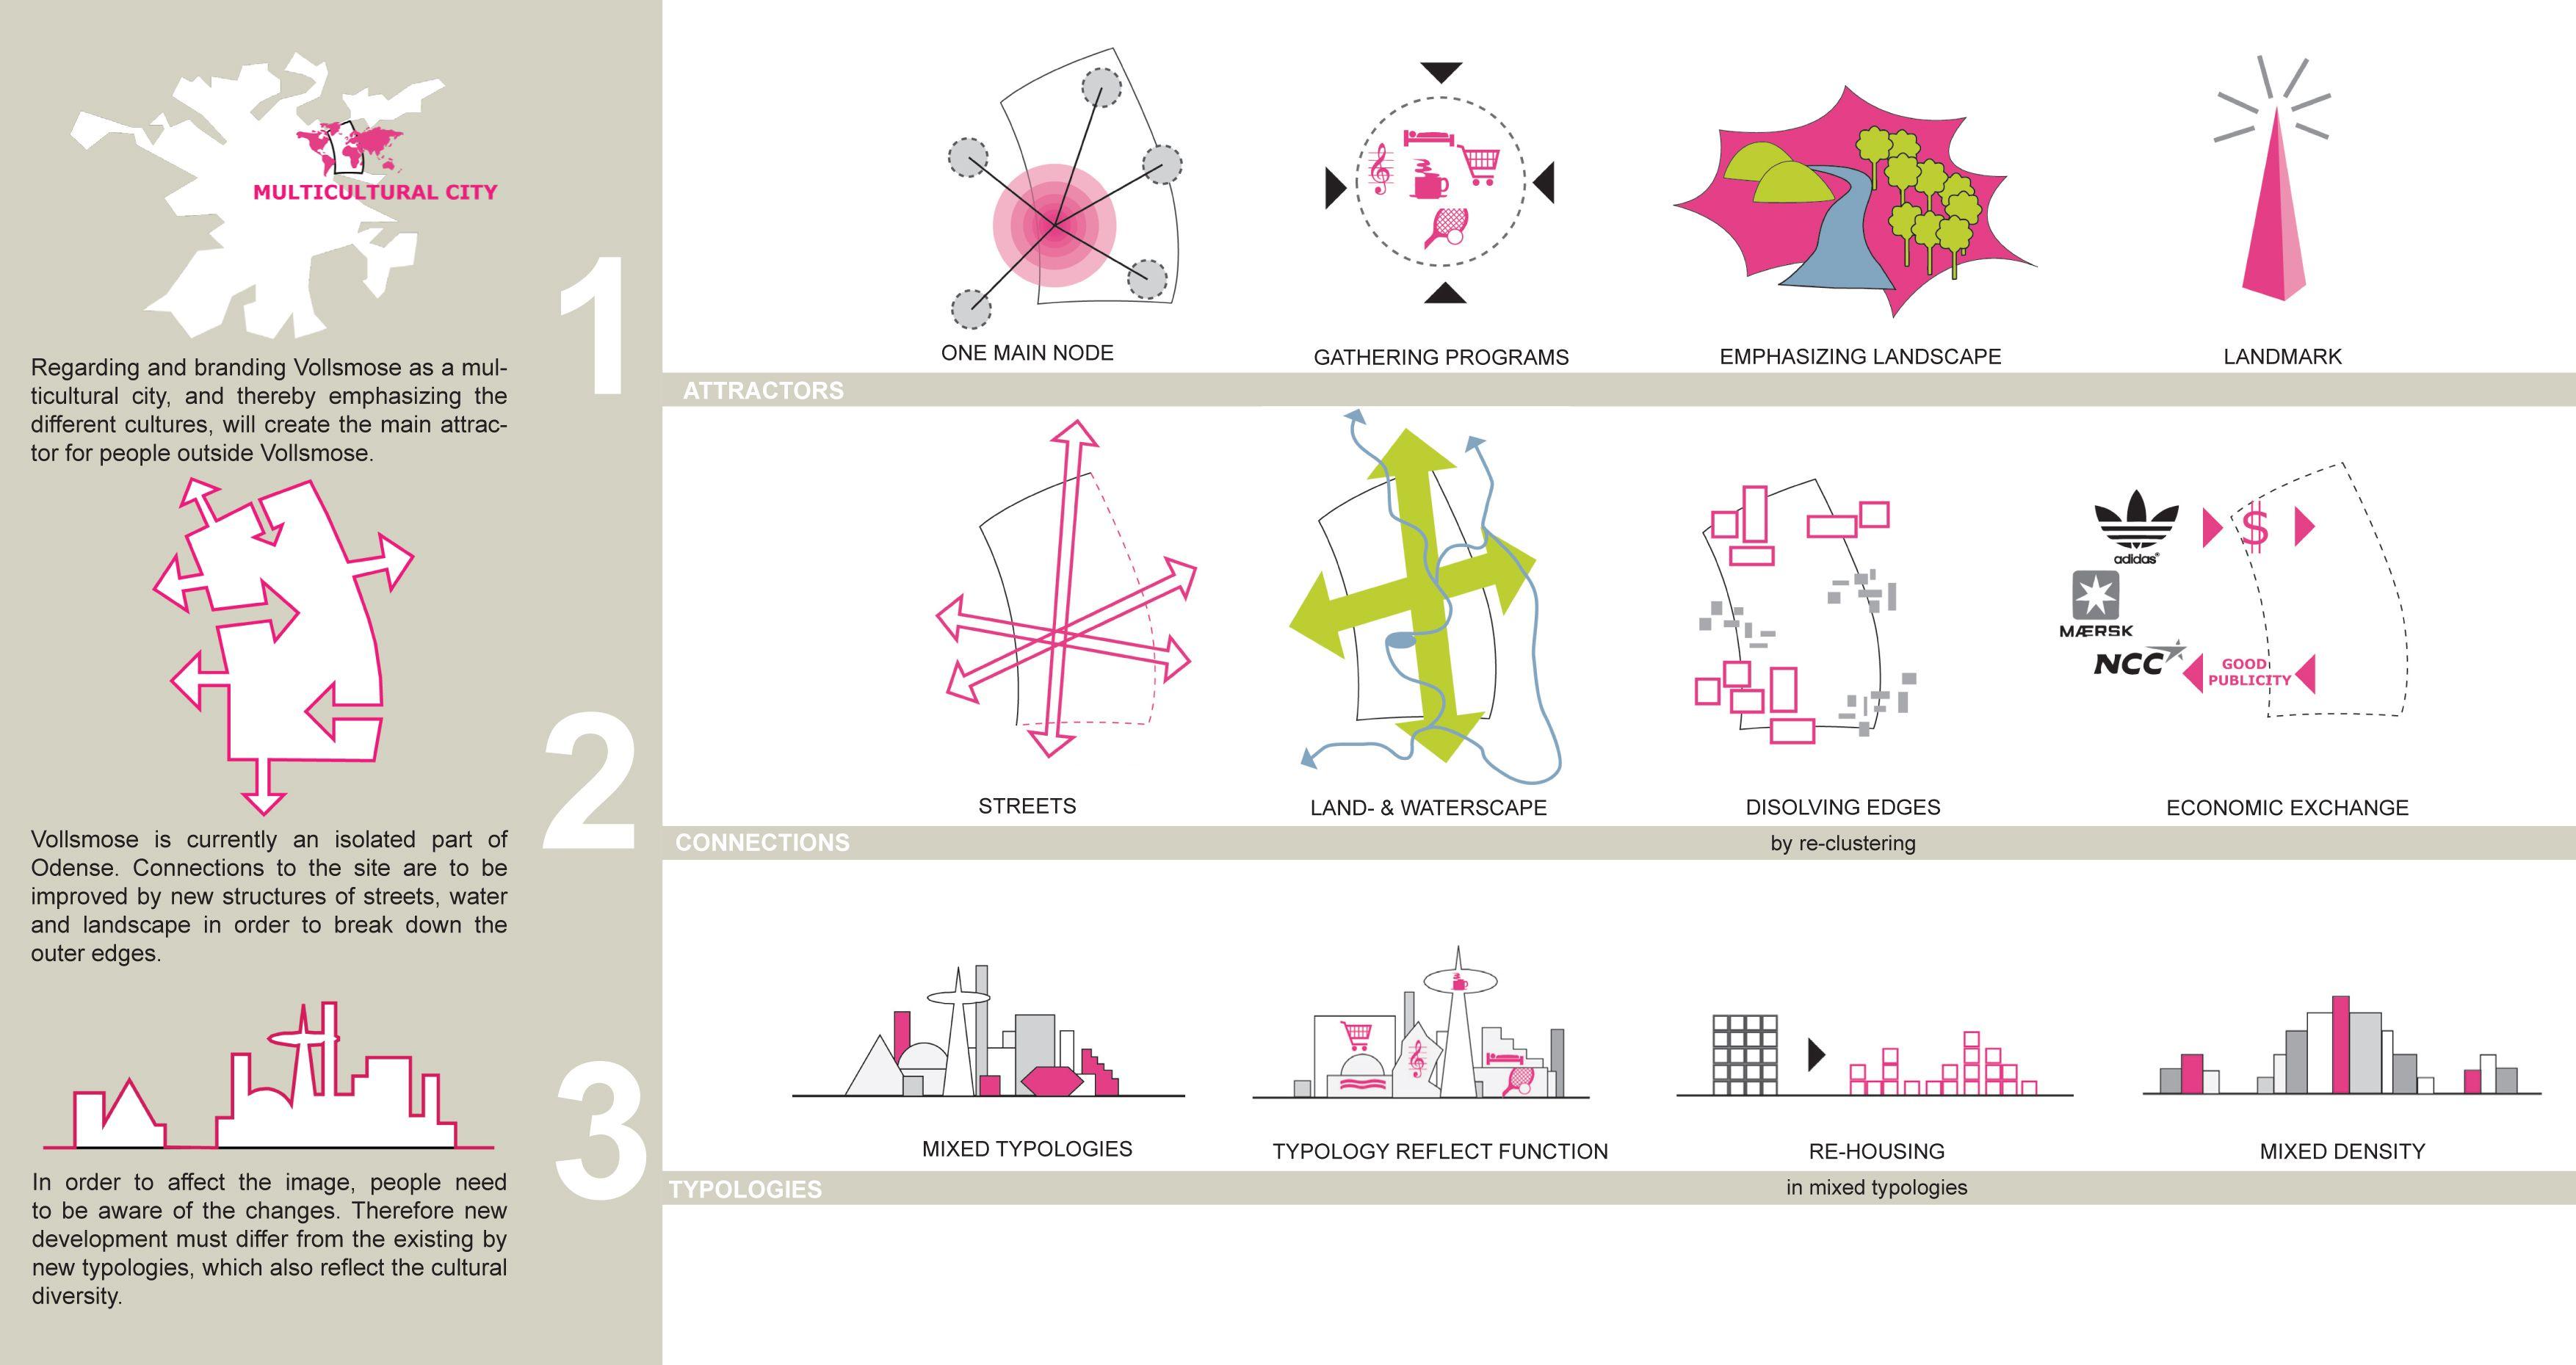 Urban Design Concepts Diagram  Uc774 Ubbf8 Uc9c0  Ud3ec Ud568